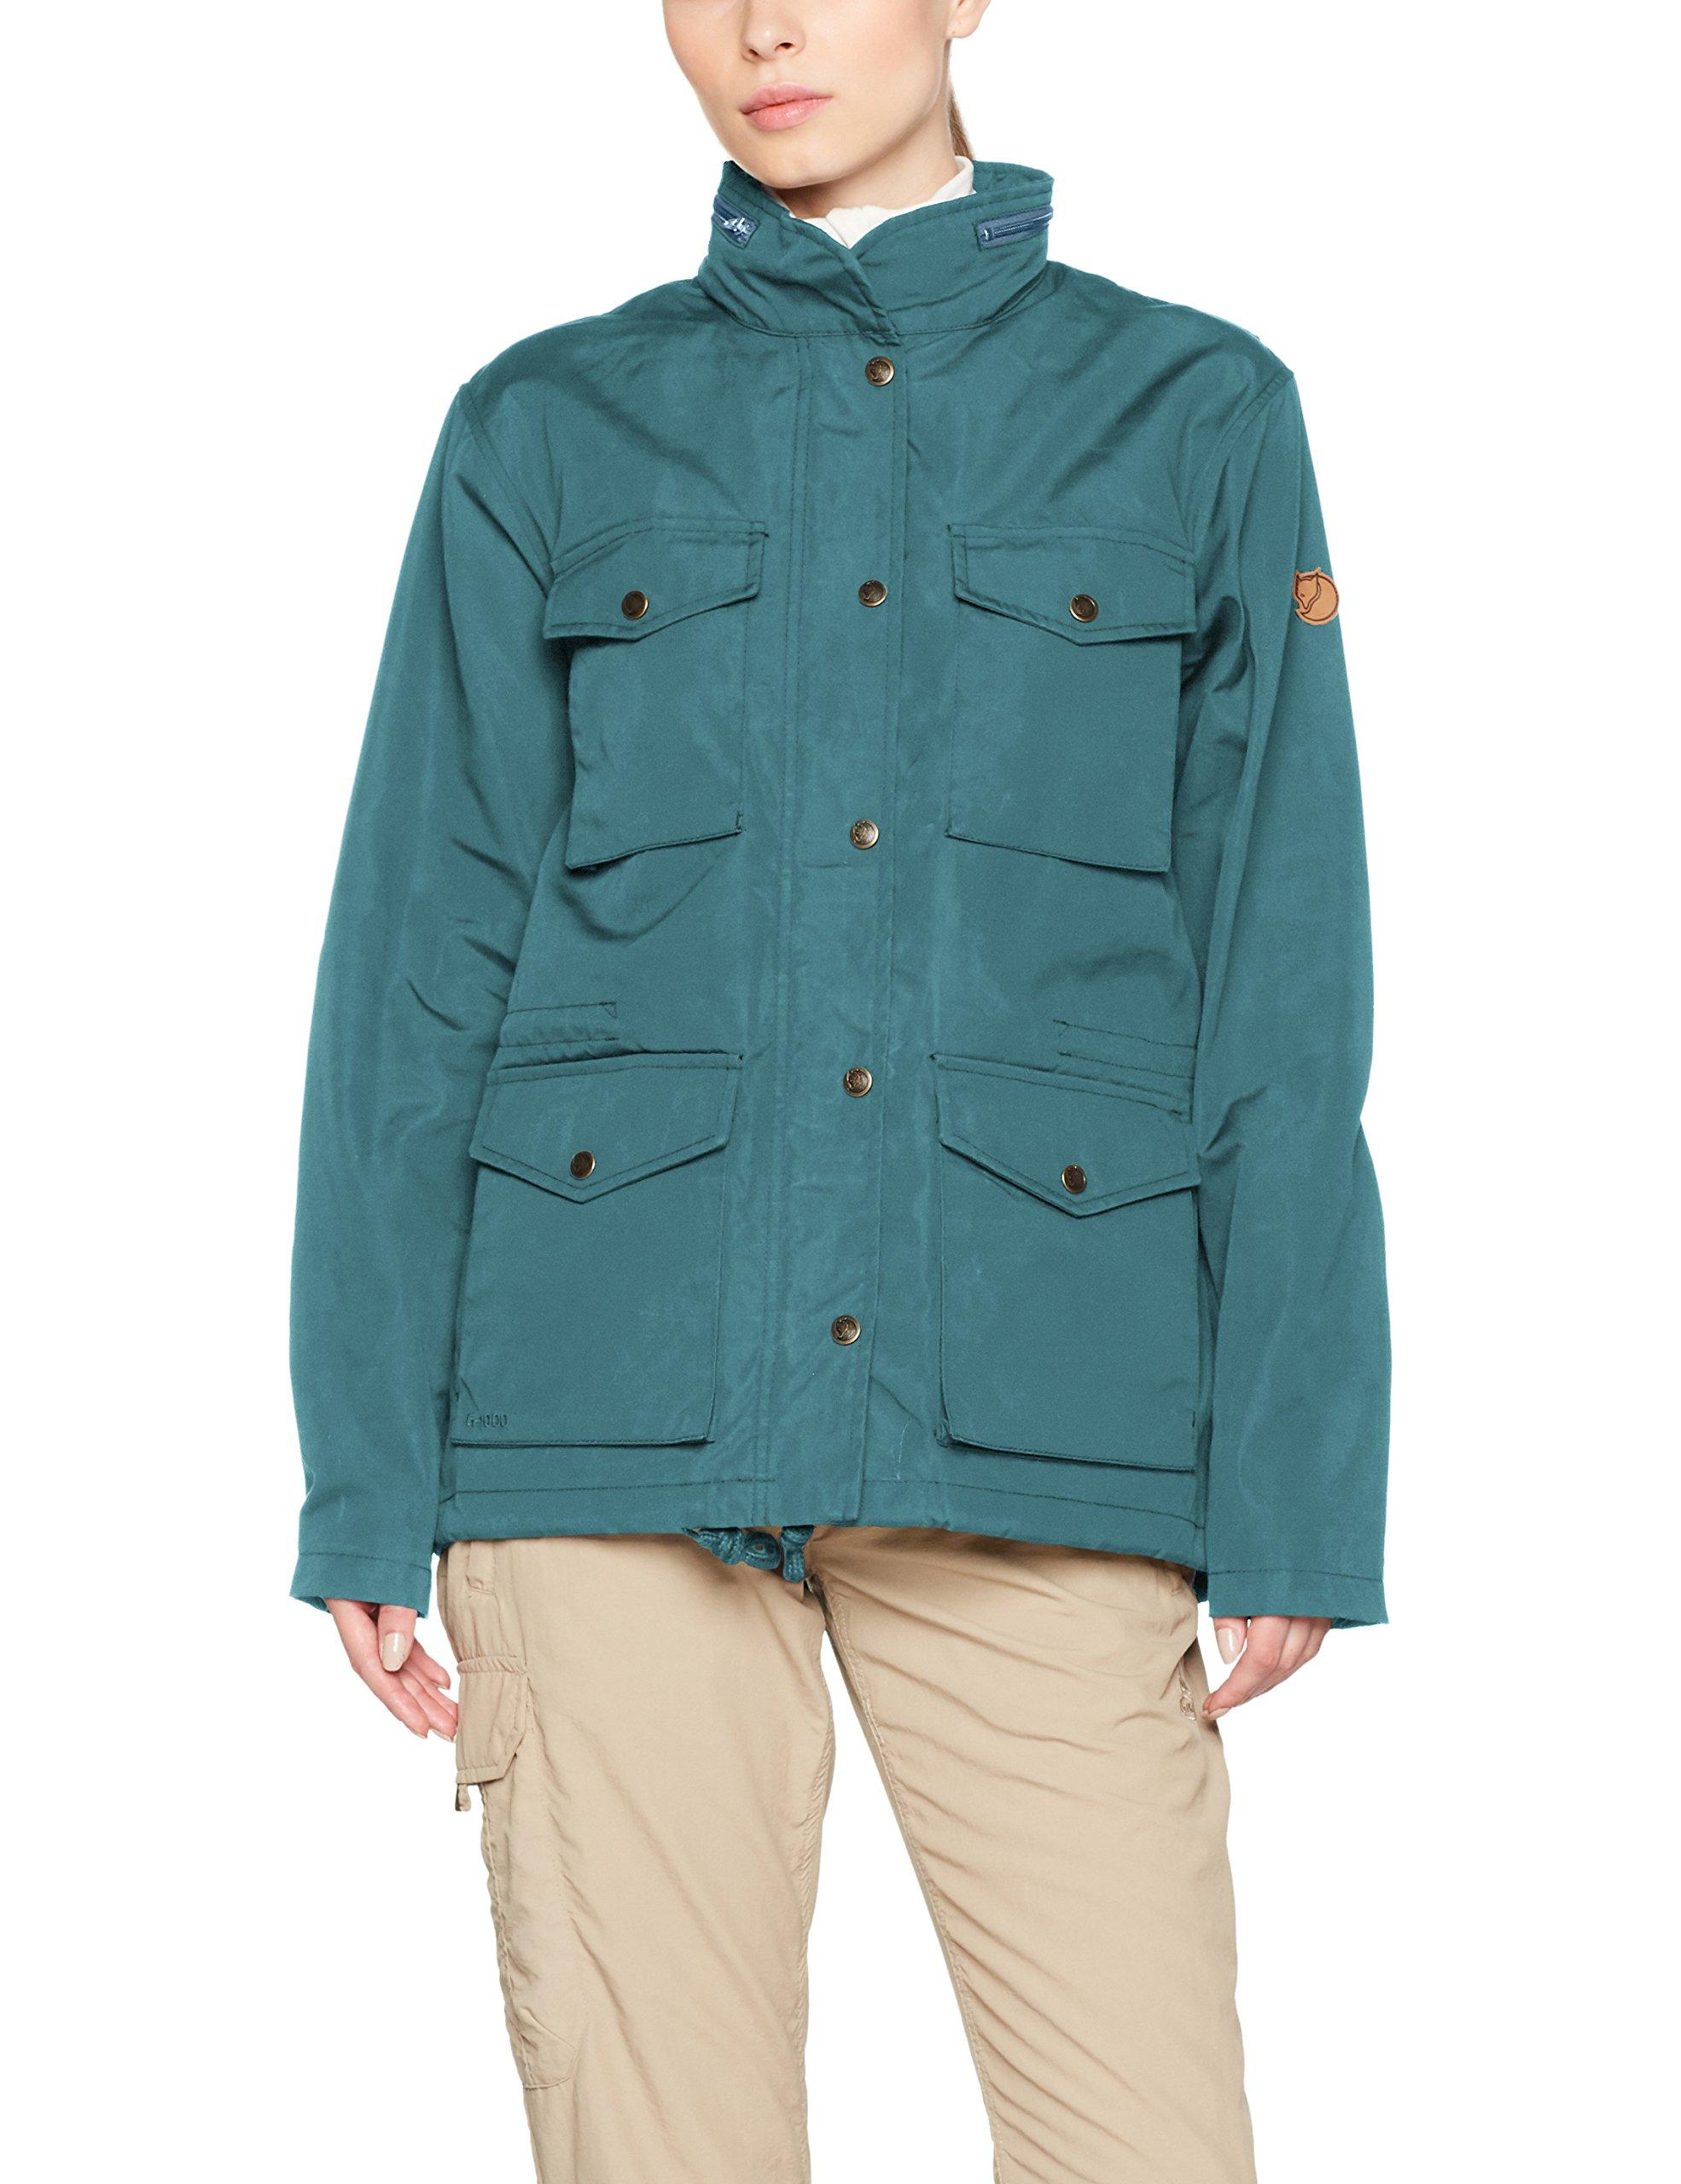 Fjallraven - Women's Raven Jacket, Frost Green, S